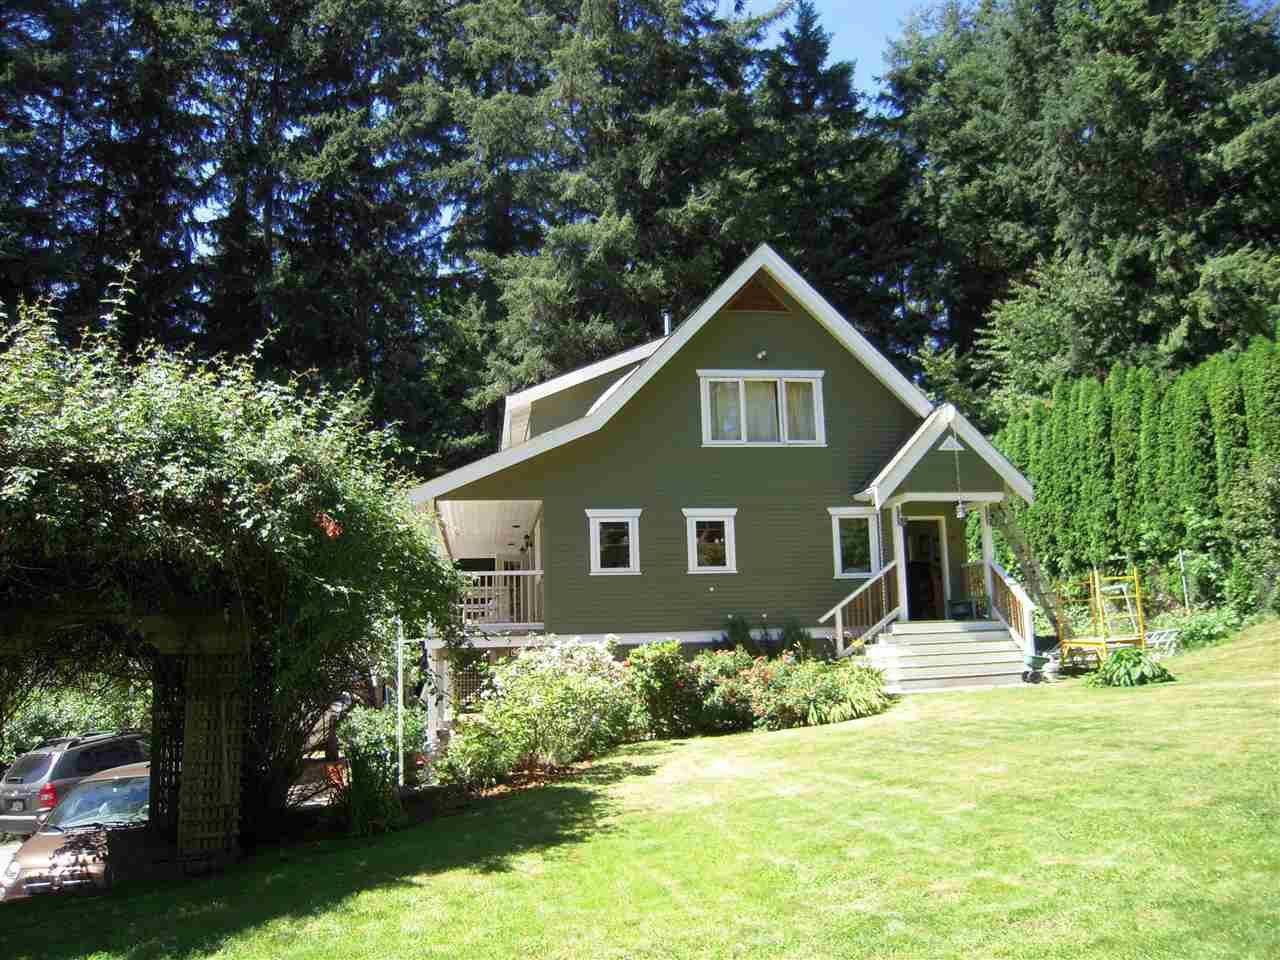 Photo 3: Photos: 2670 LOWER Road: Roberts Creek House for sale (Sunshine Coast)  : MLS®# R2096275